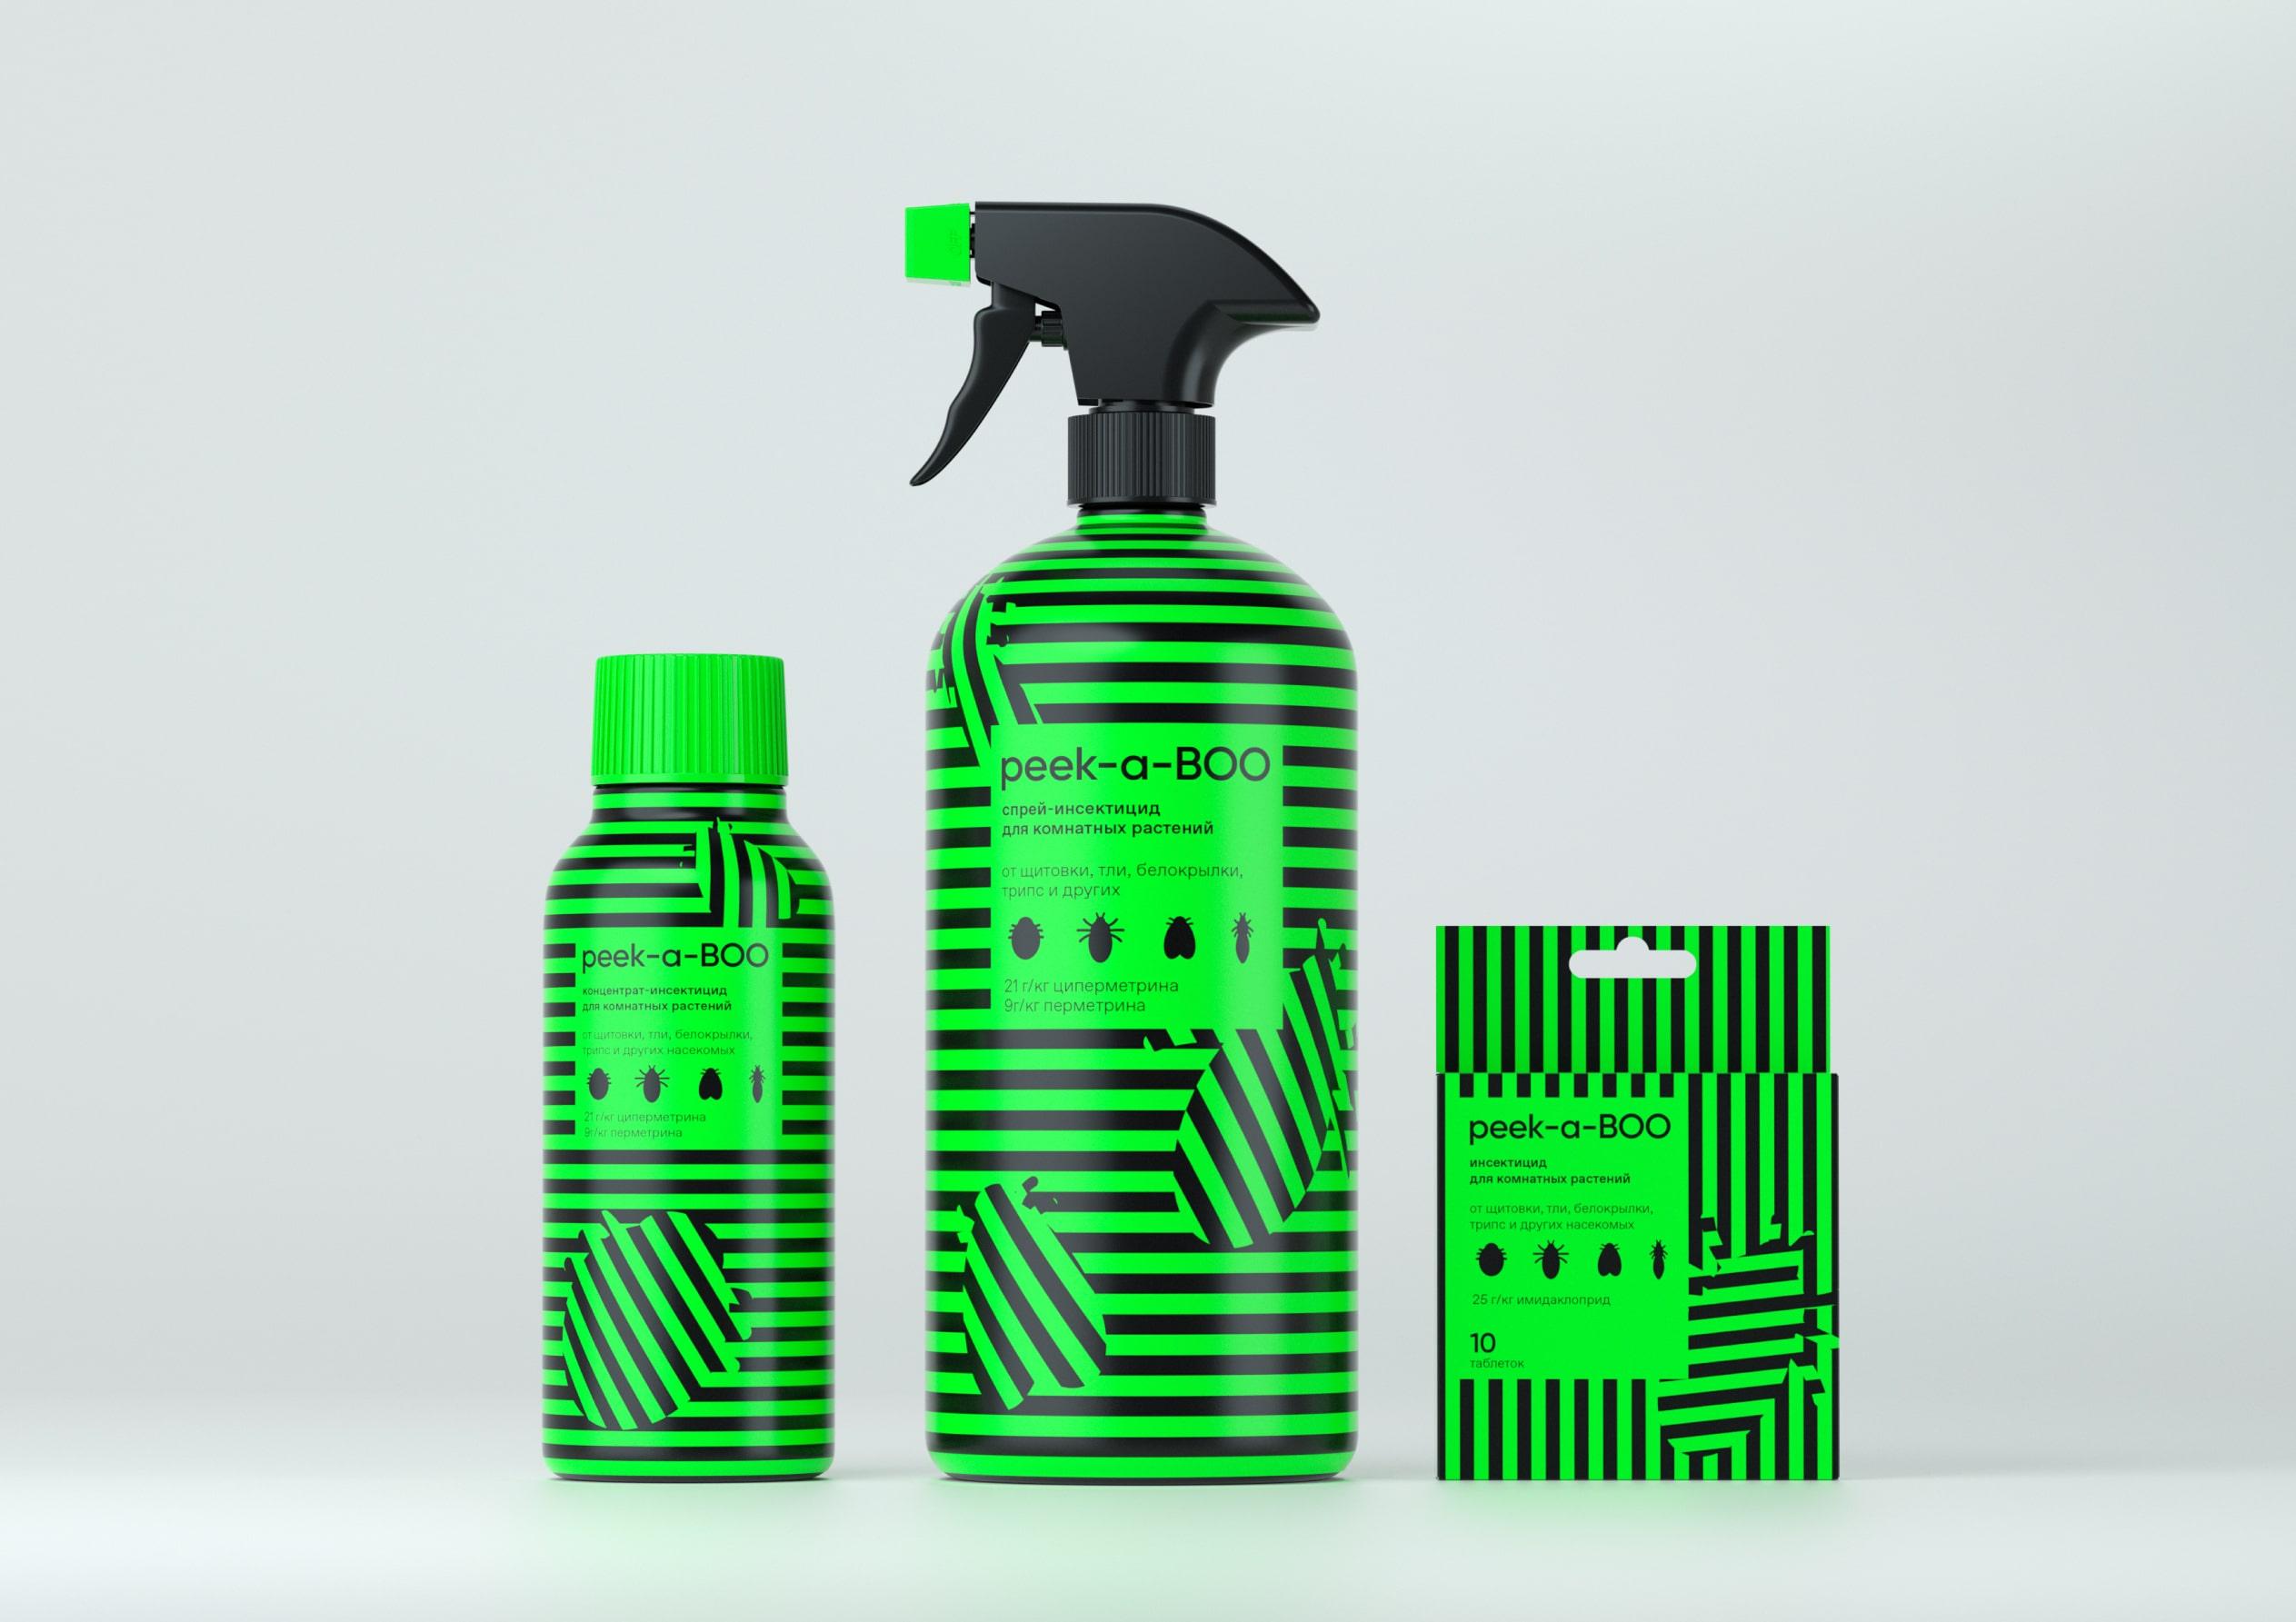 peek-a-Boo Houseplant Pest Remedy Packaging Design